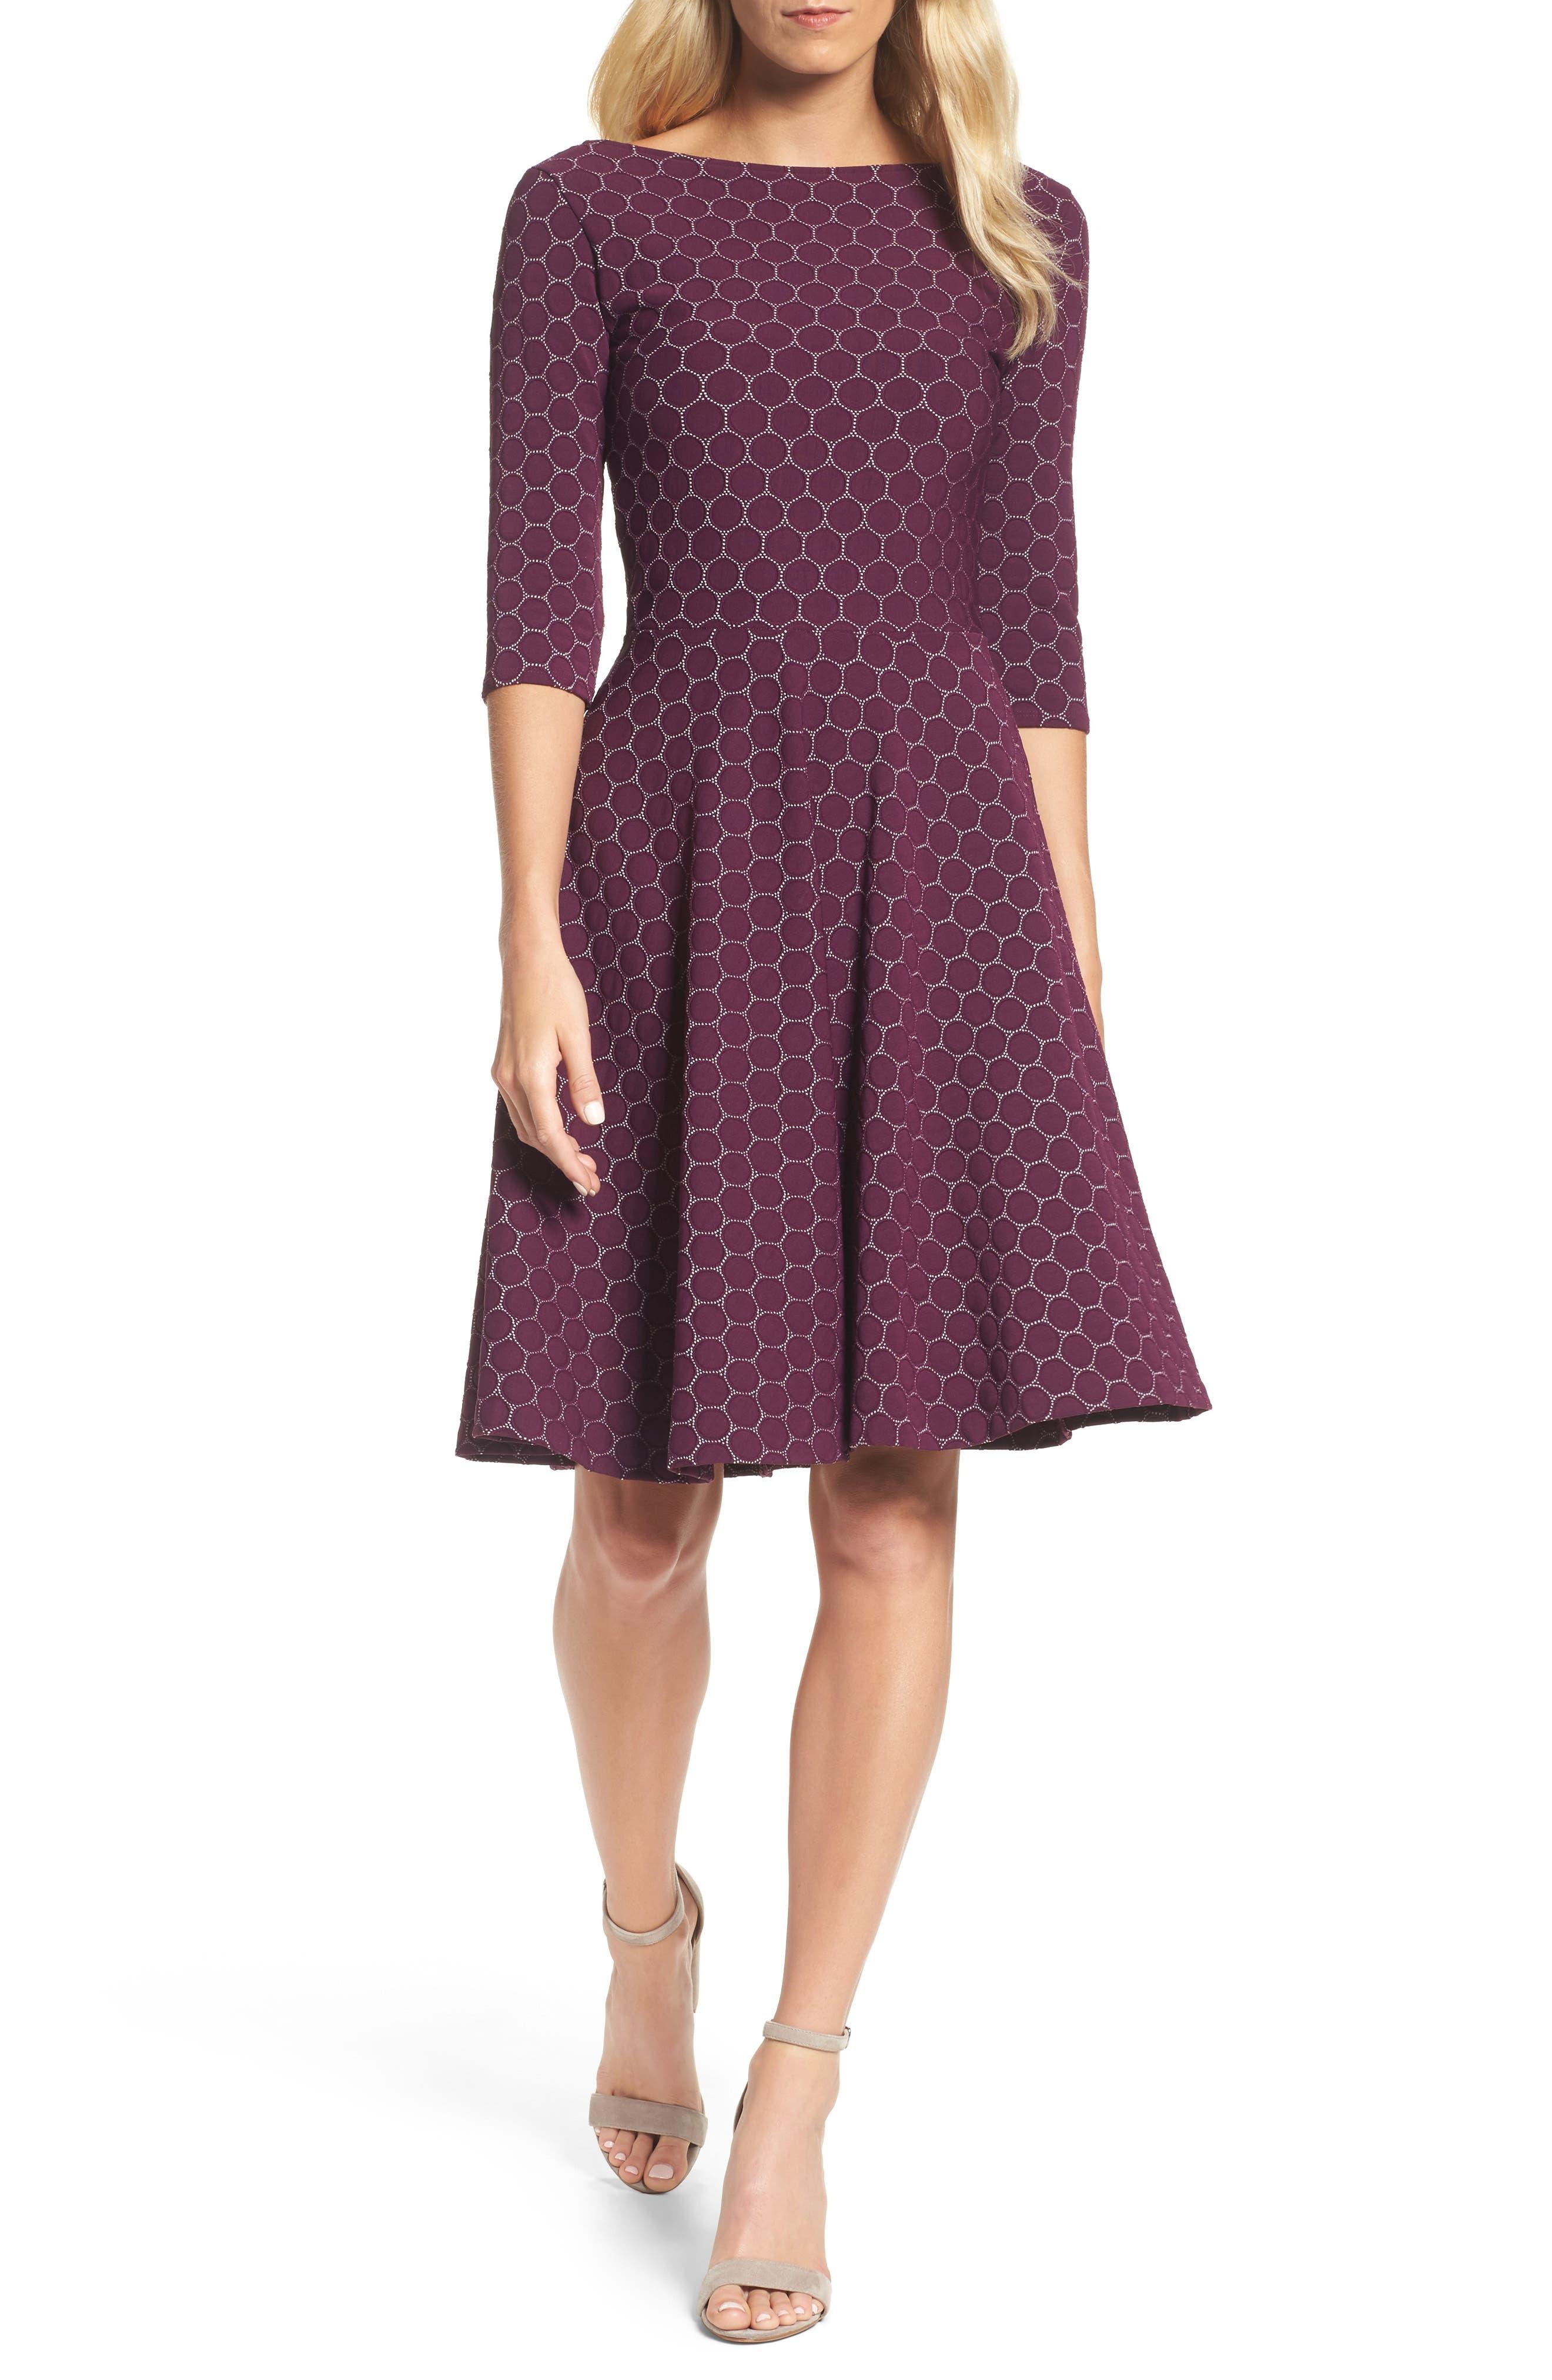 Main Image - Leota Circle Knit Fit & Flare Dress